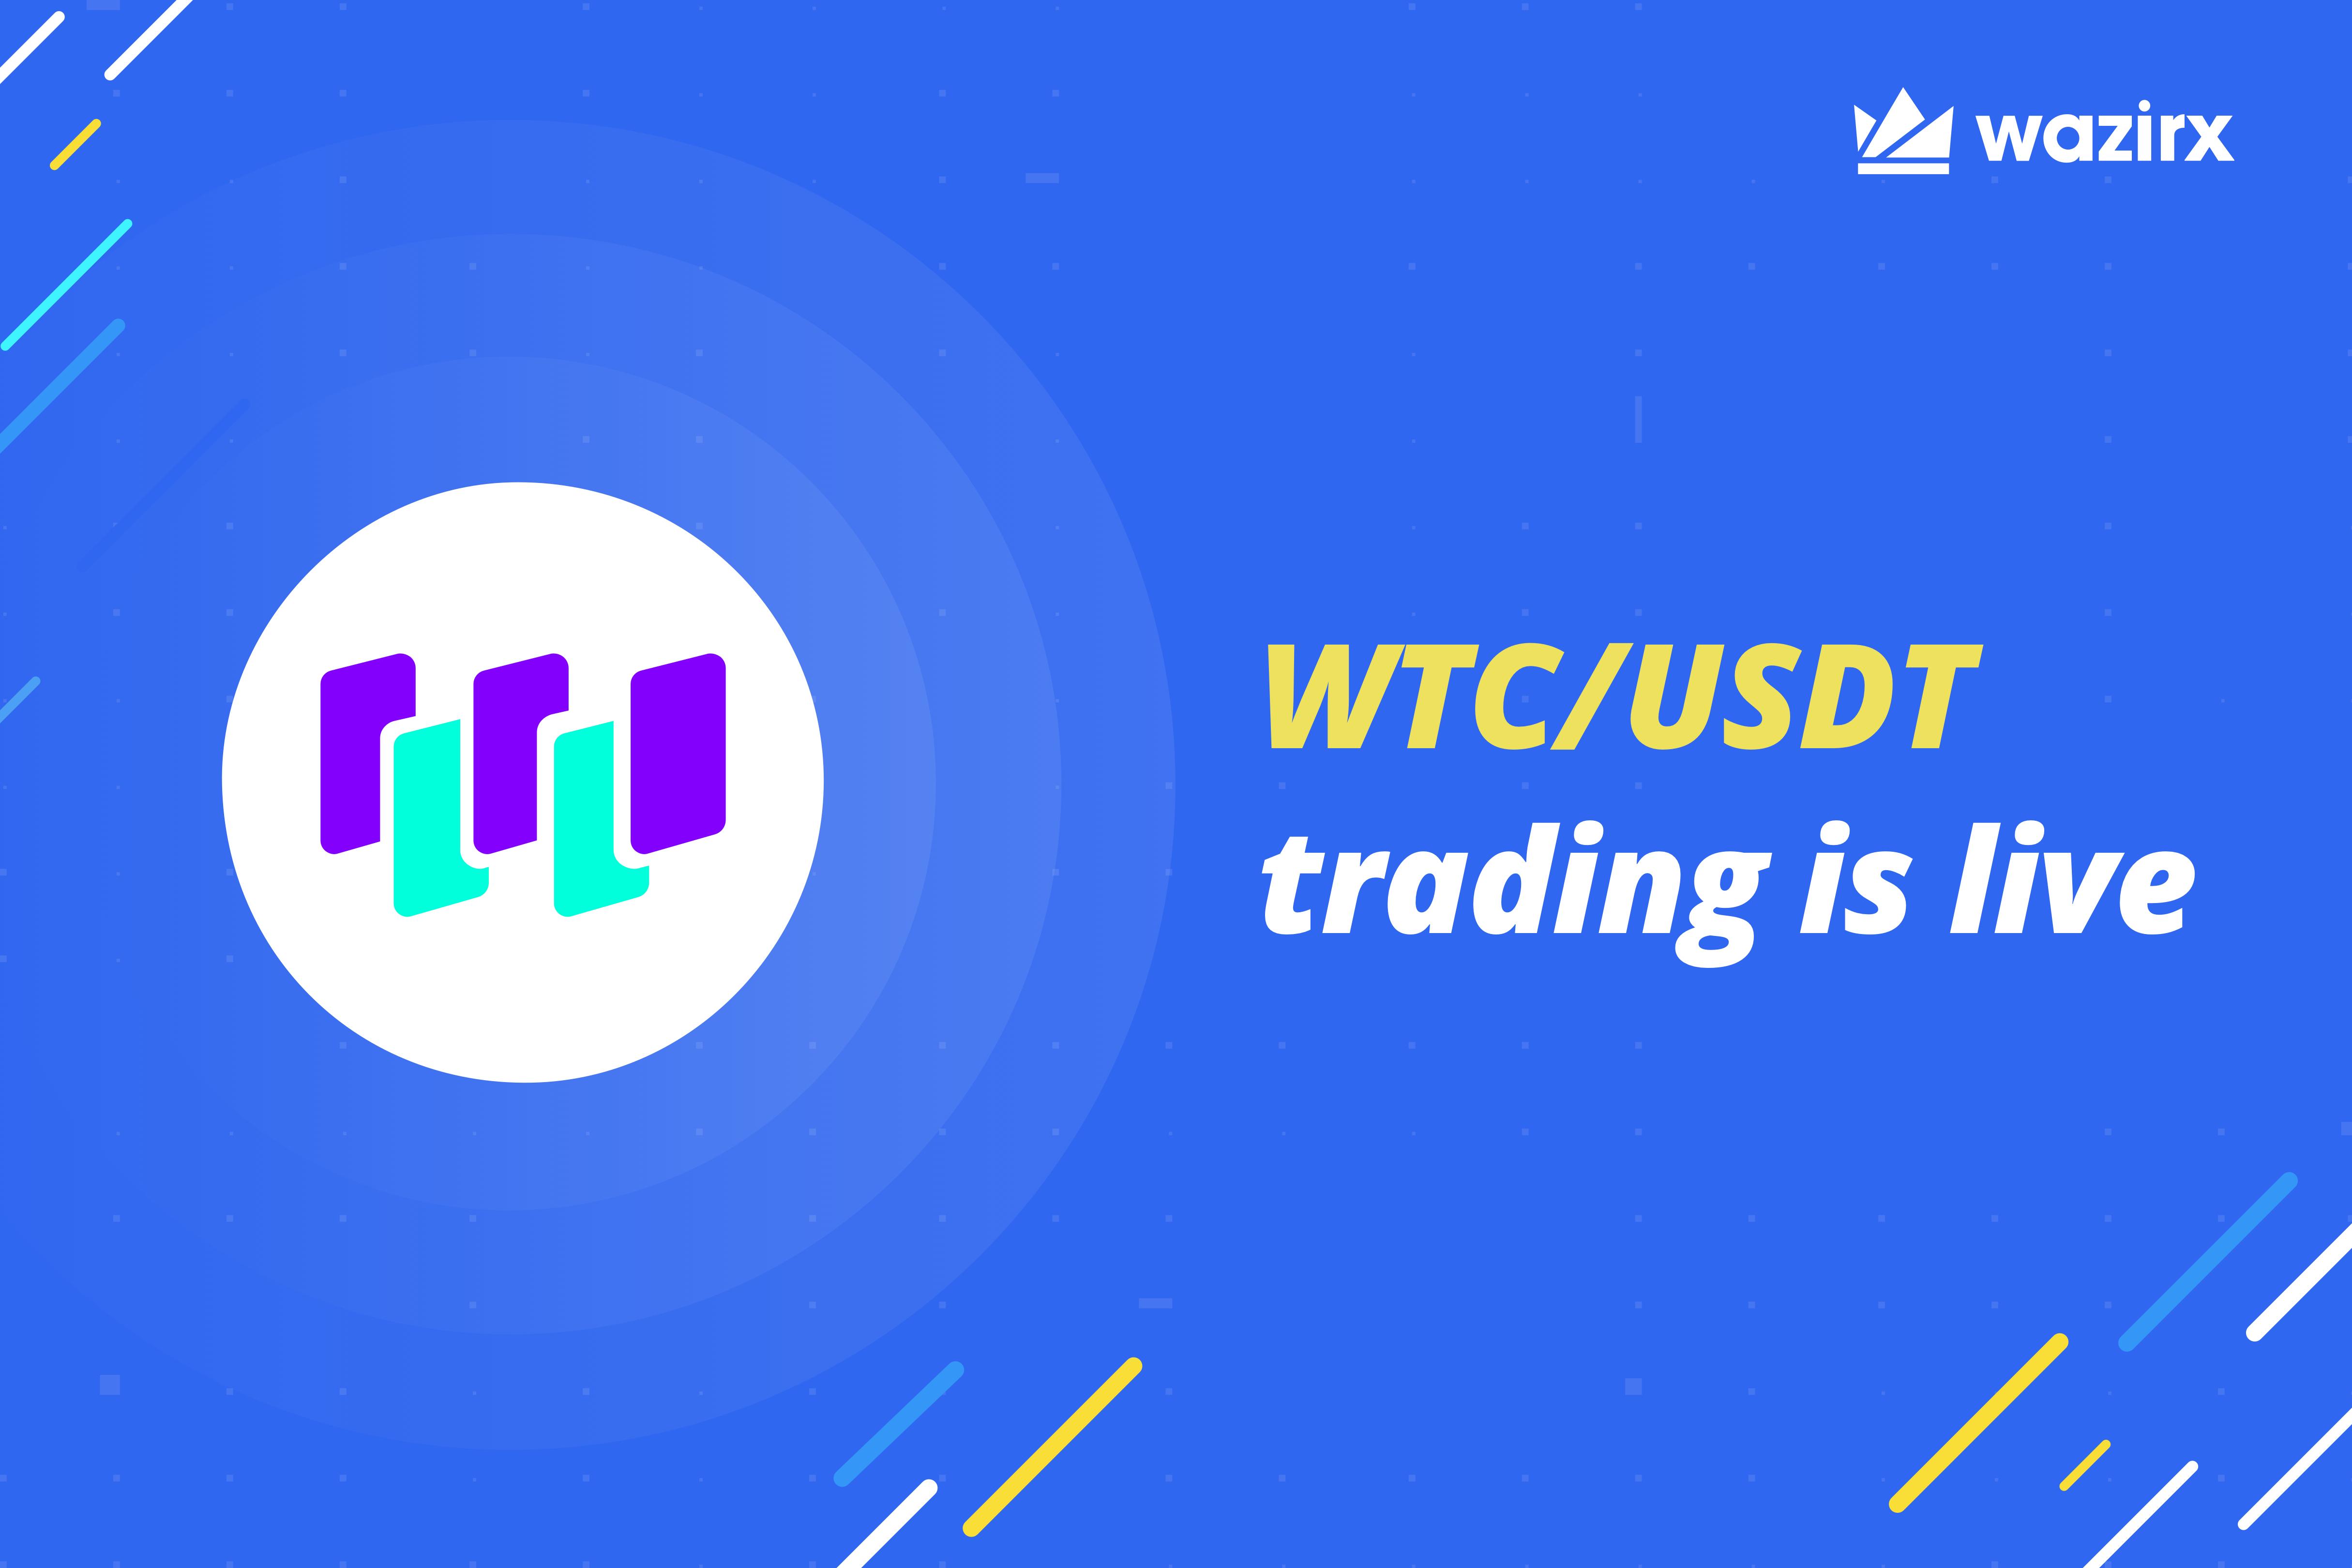 WTC/USDT trading is live on WazirX